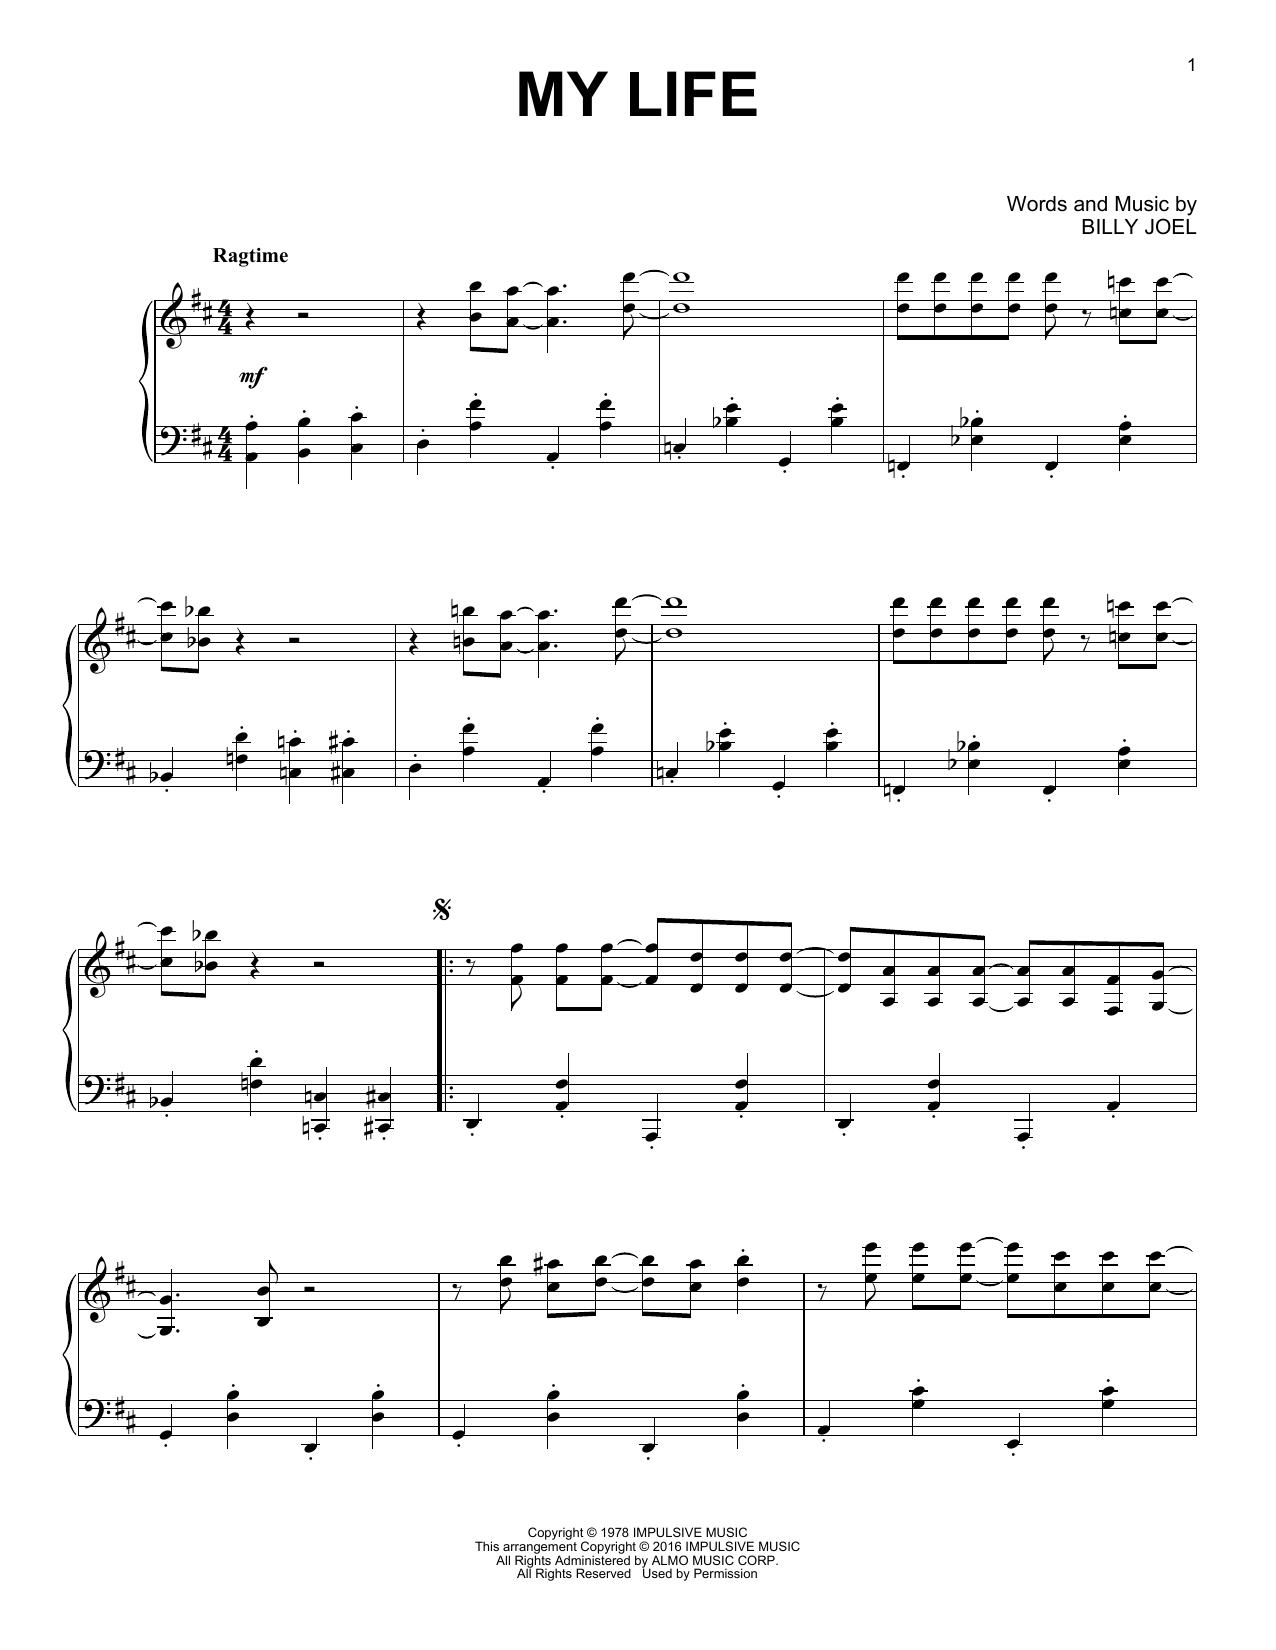 Billy Joel My Life [Jazz version] sheet music notes and chords. Download Printable PDF.